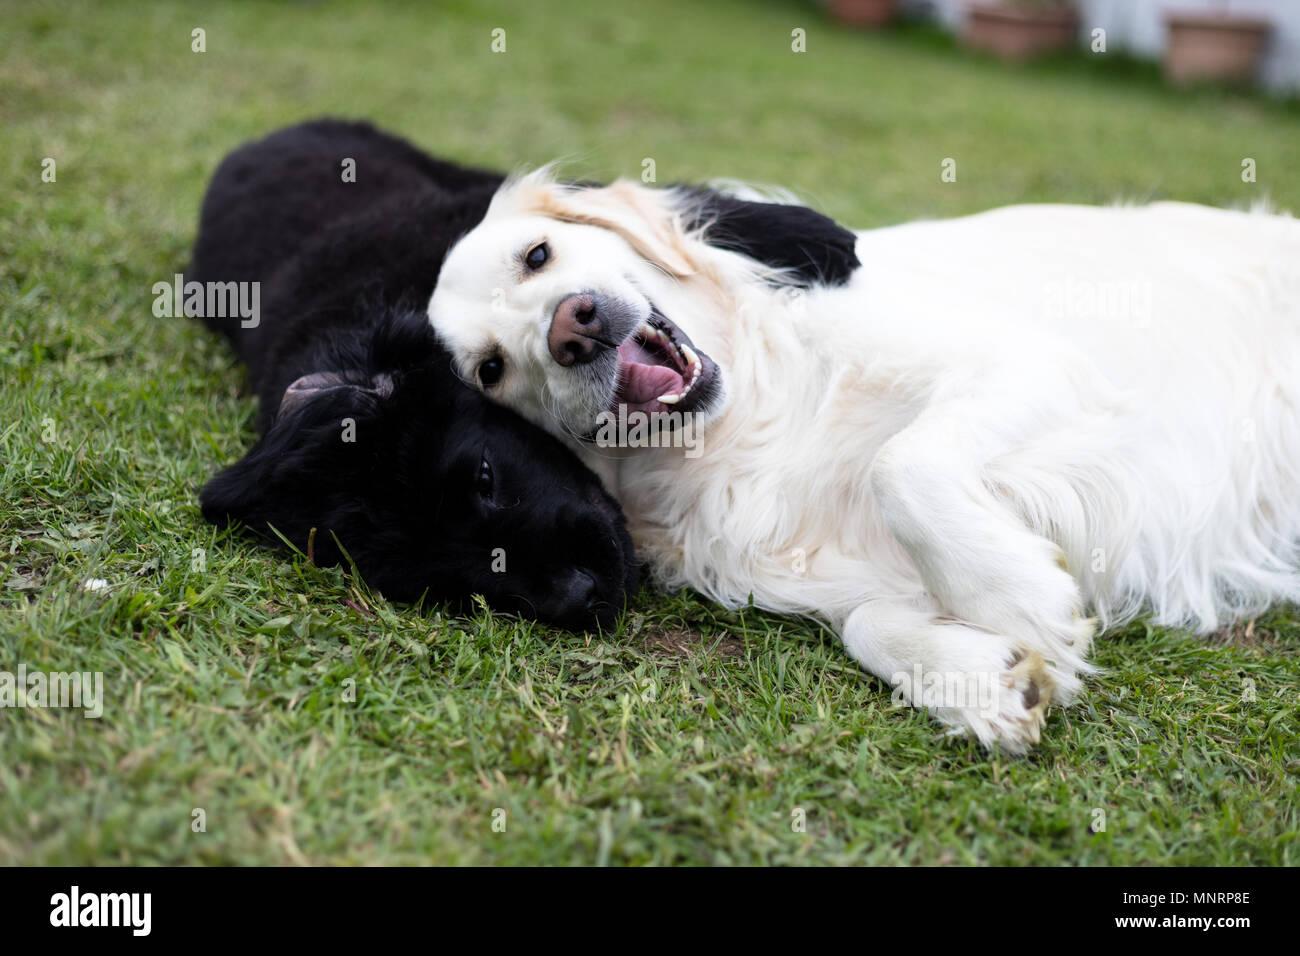 Dog Newfoundland Puppy Black White Stockfotos & Dog Newfoundland ...